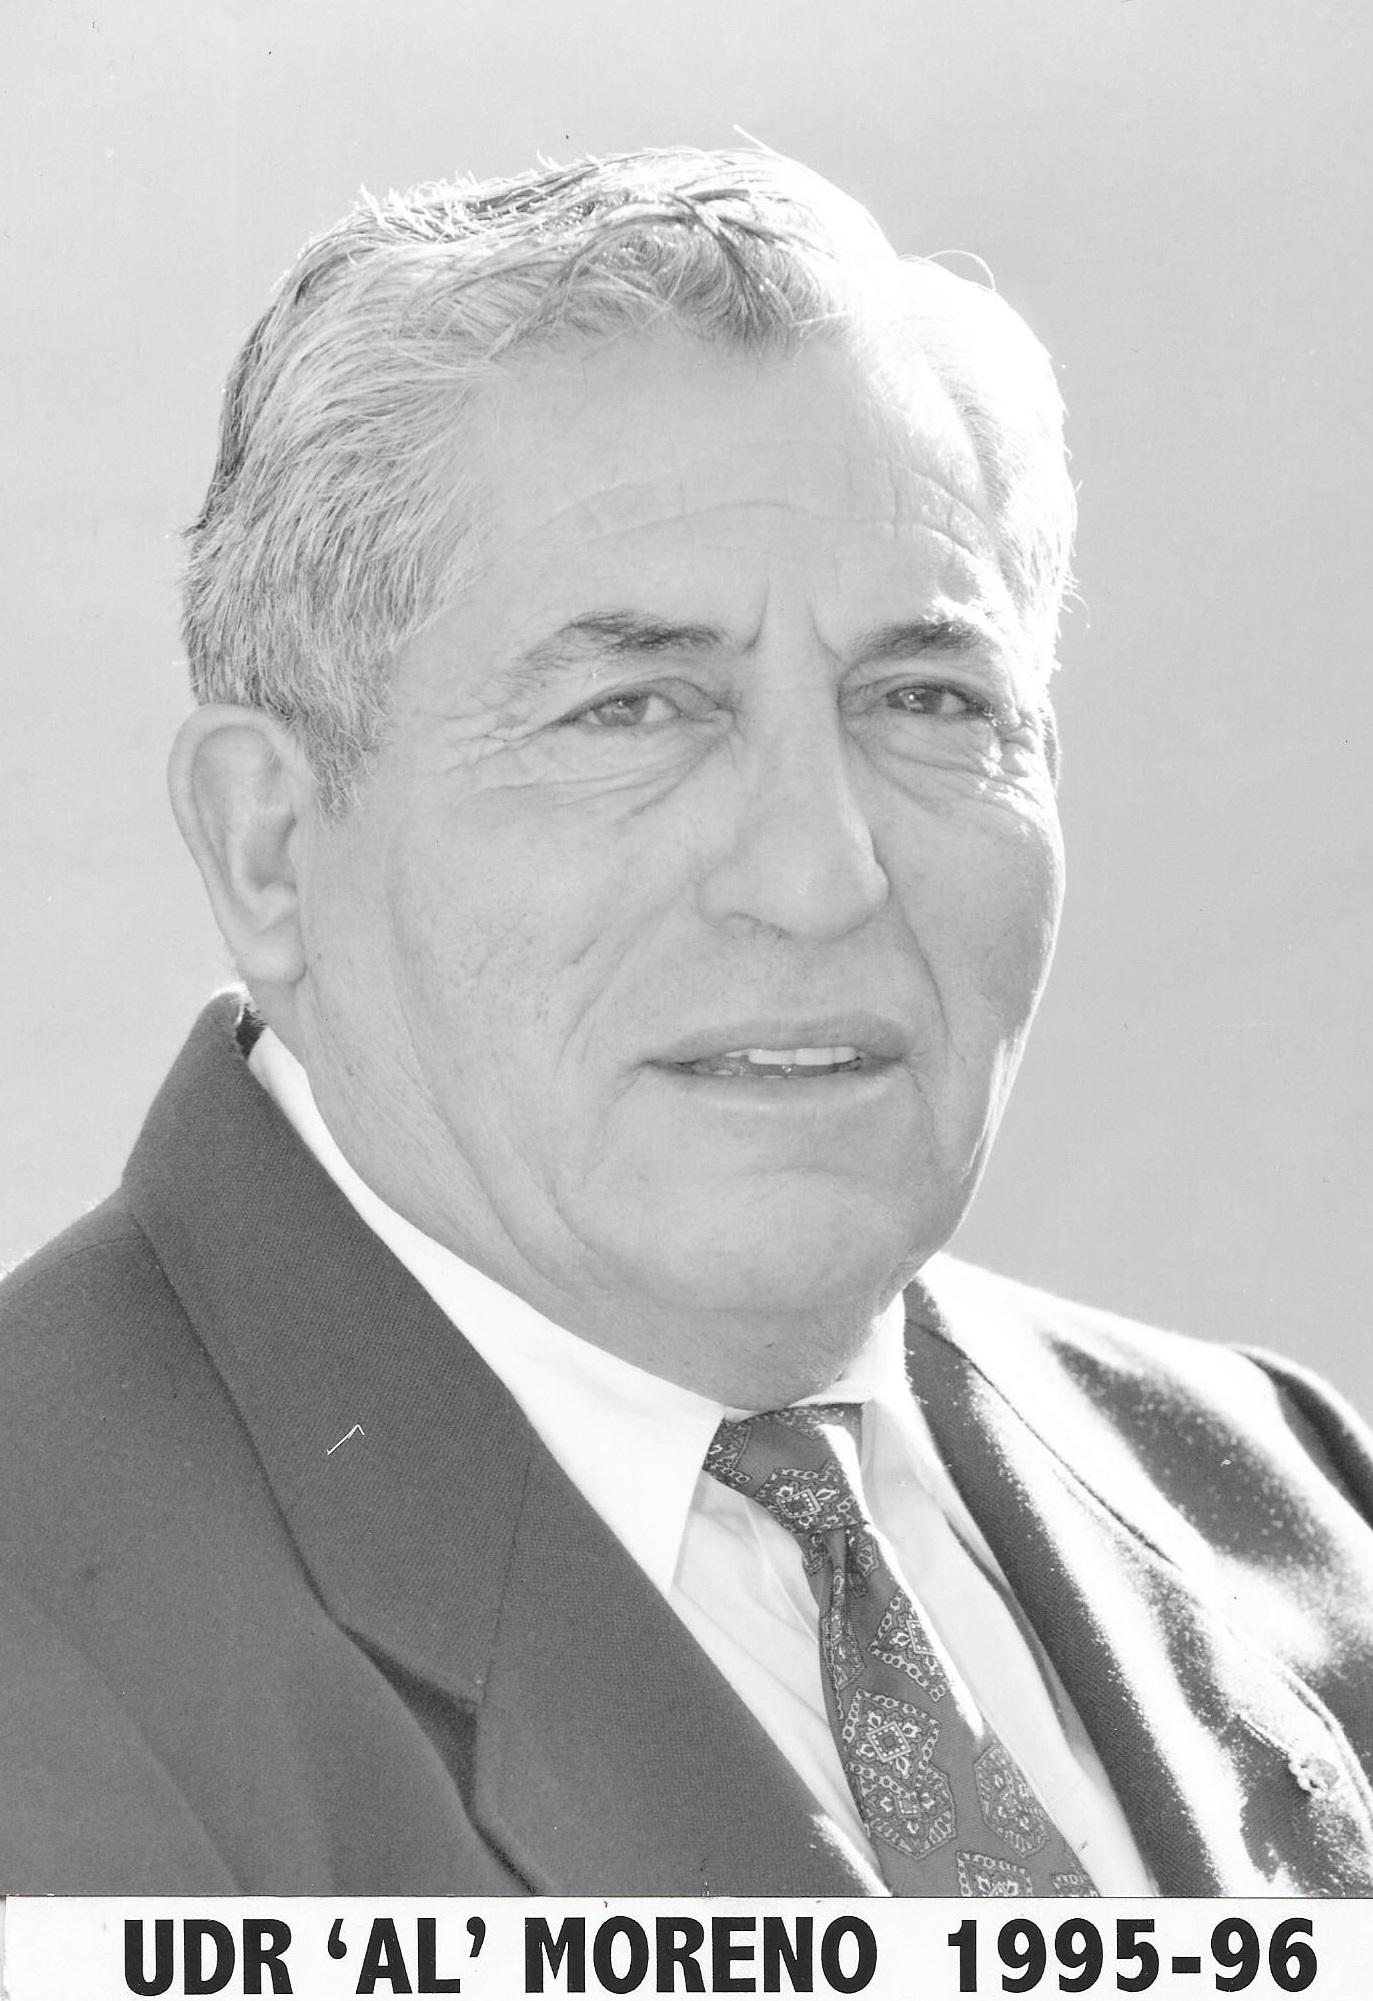 UDR AL Moreno 001.jpg